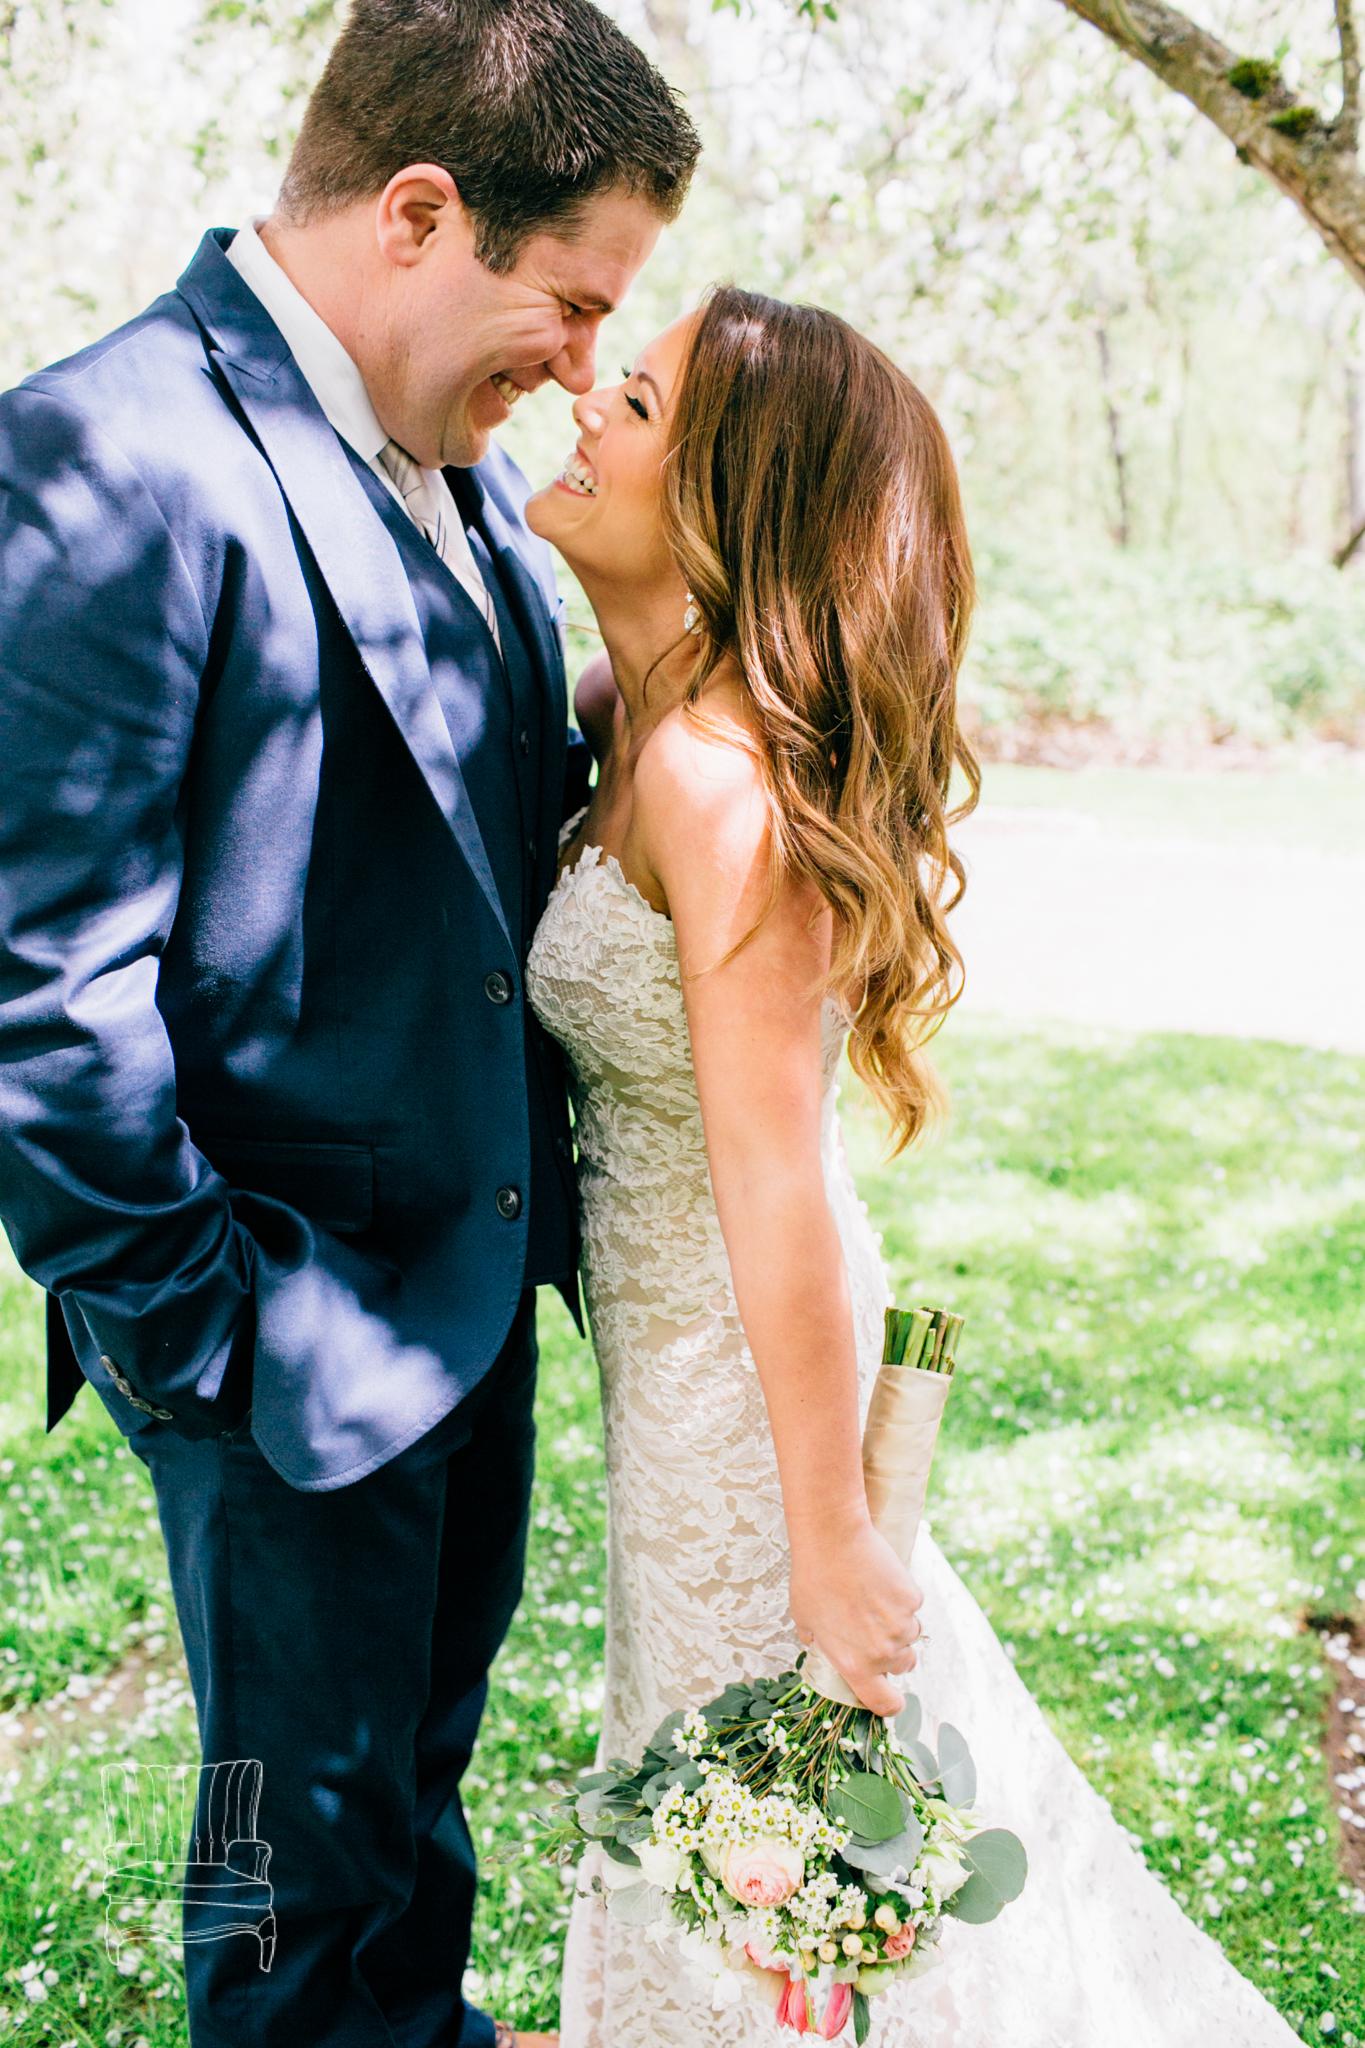 seattle-wedding-photographer-katheryn-moran-russells-bothell-wilkins-wedding-photo-17.jpg